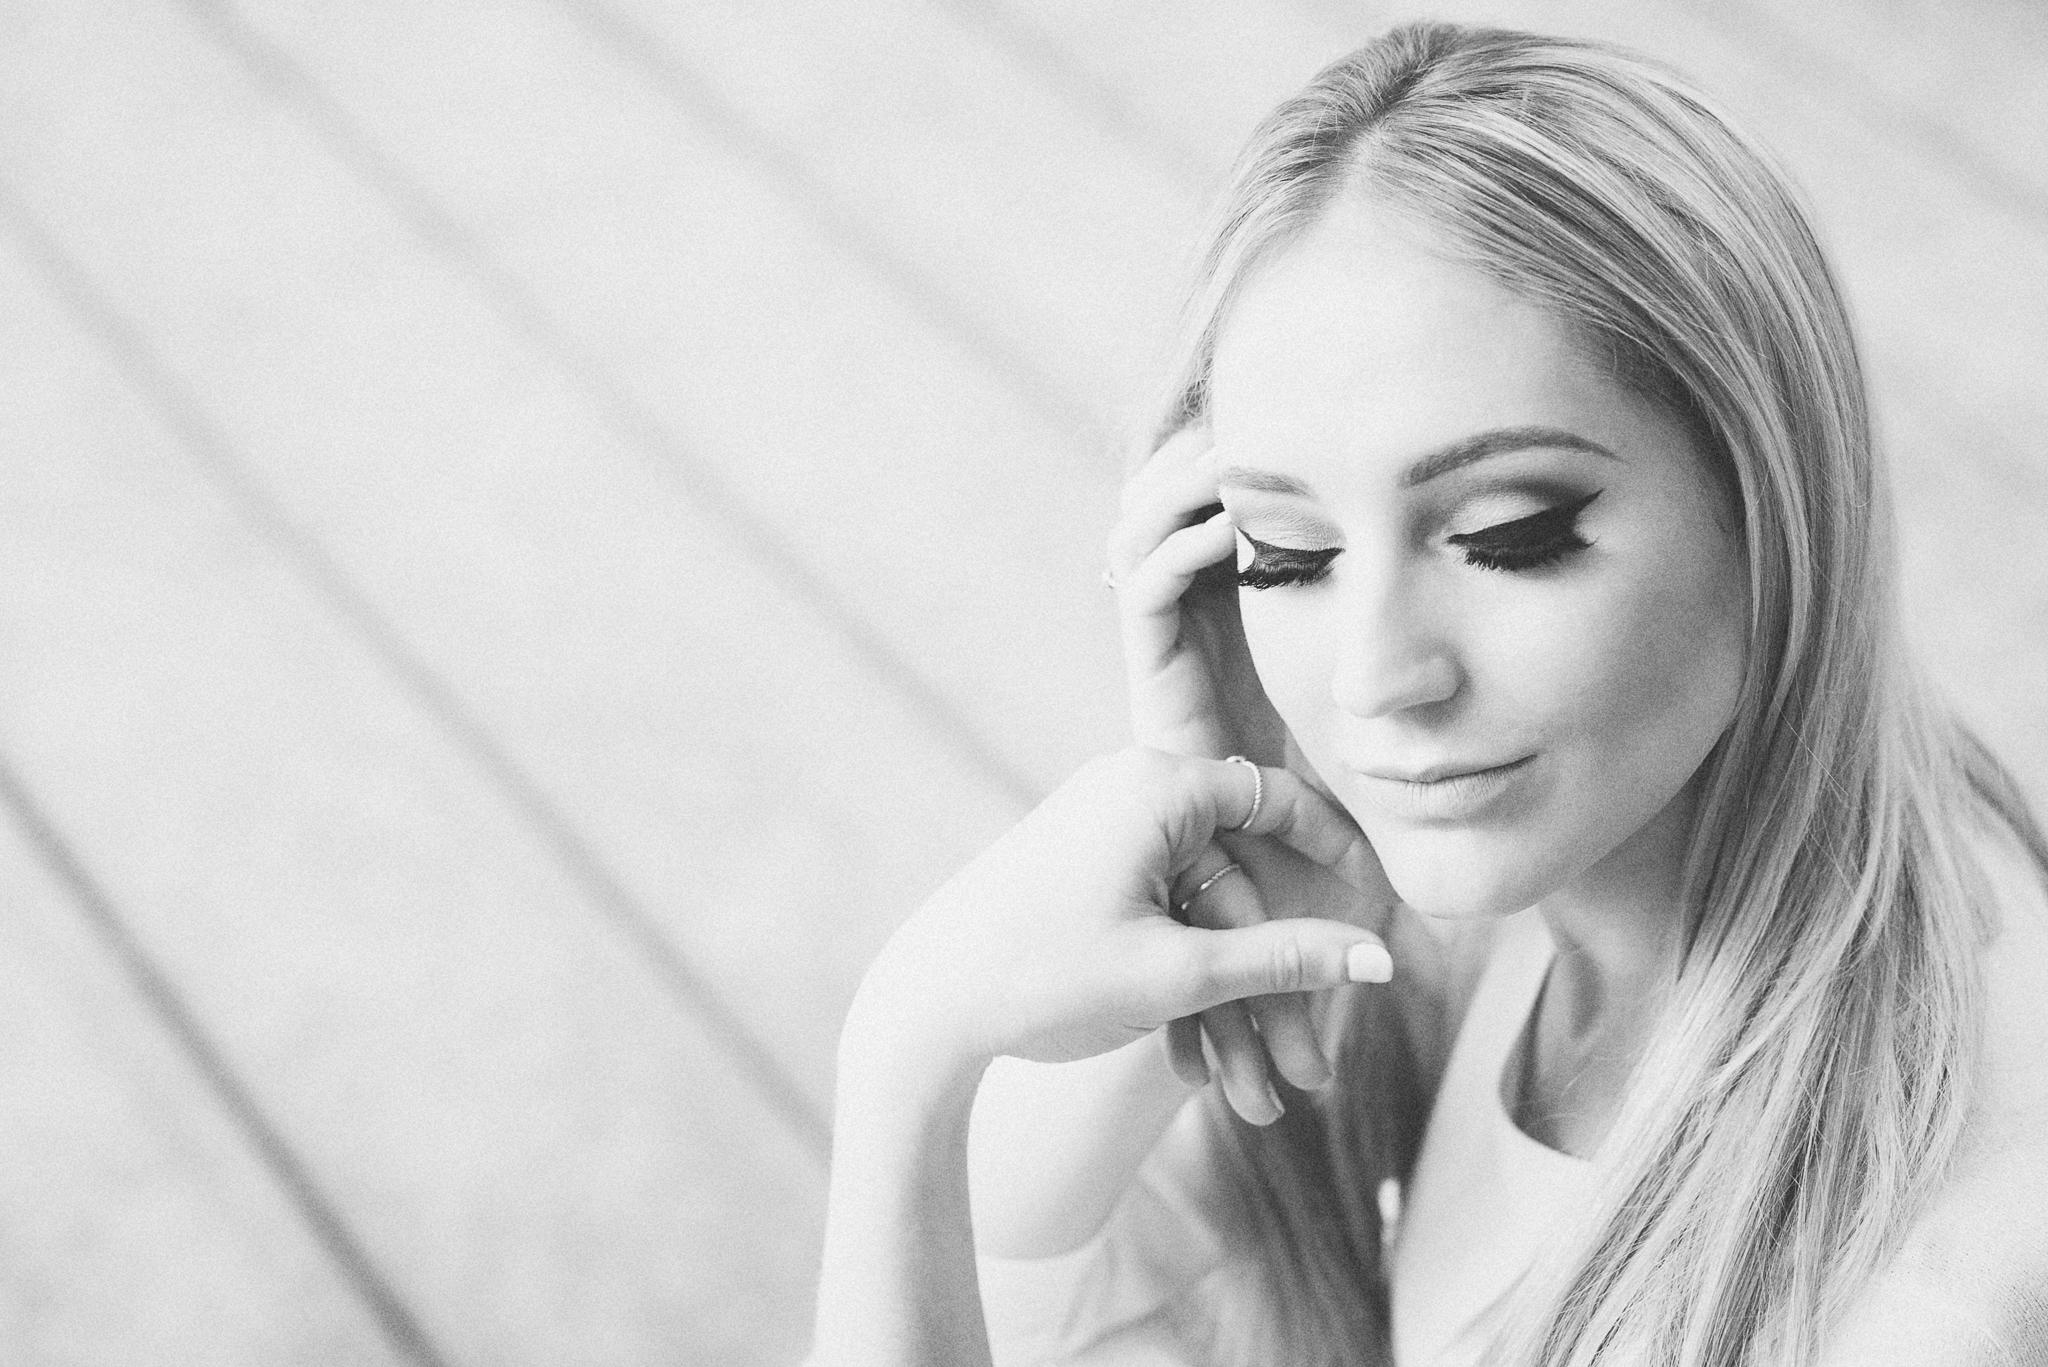 Denver-Portrait-Photographer-Mark-Ross-Photography-Portfolio-Nicole-8.jpg